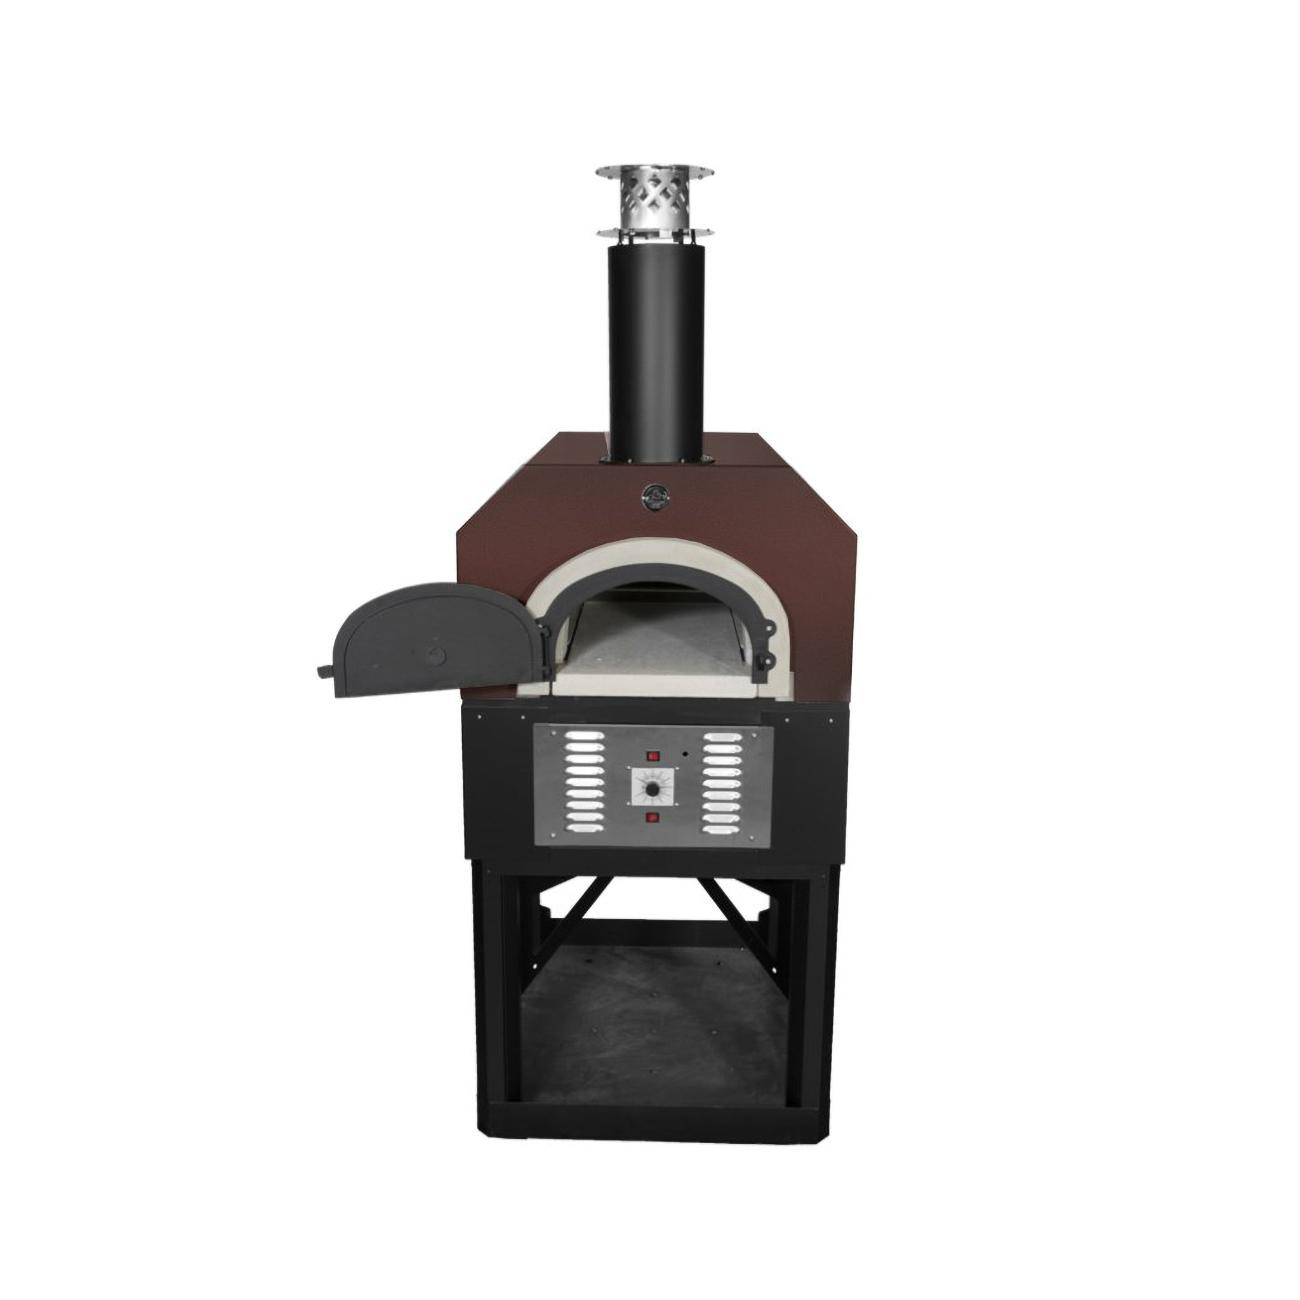 Chicago Brick Oven Cbo-750 Hybrid Residential Outdoor Pizza Oven On Stand - Propane - Copper - Cbo-o-std-750-hyb-lp-cv-r-3k